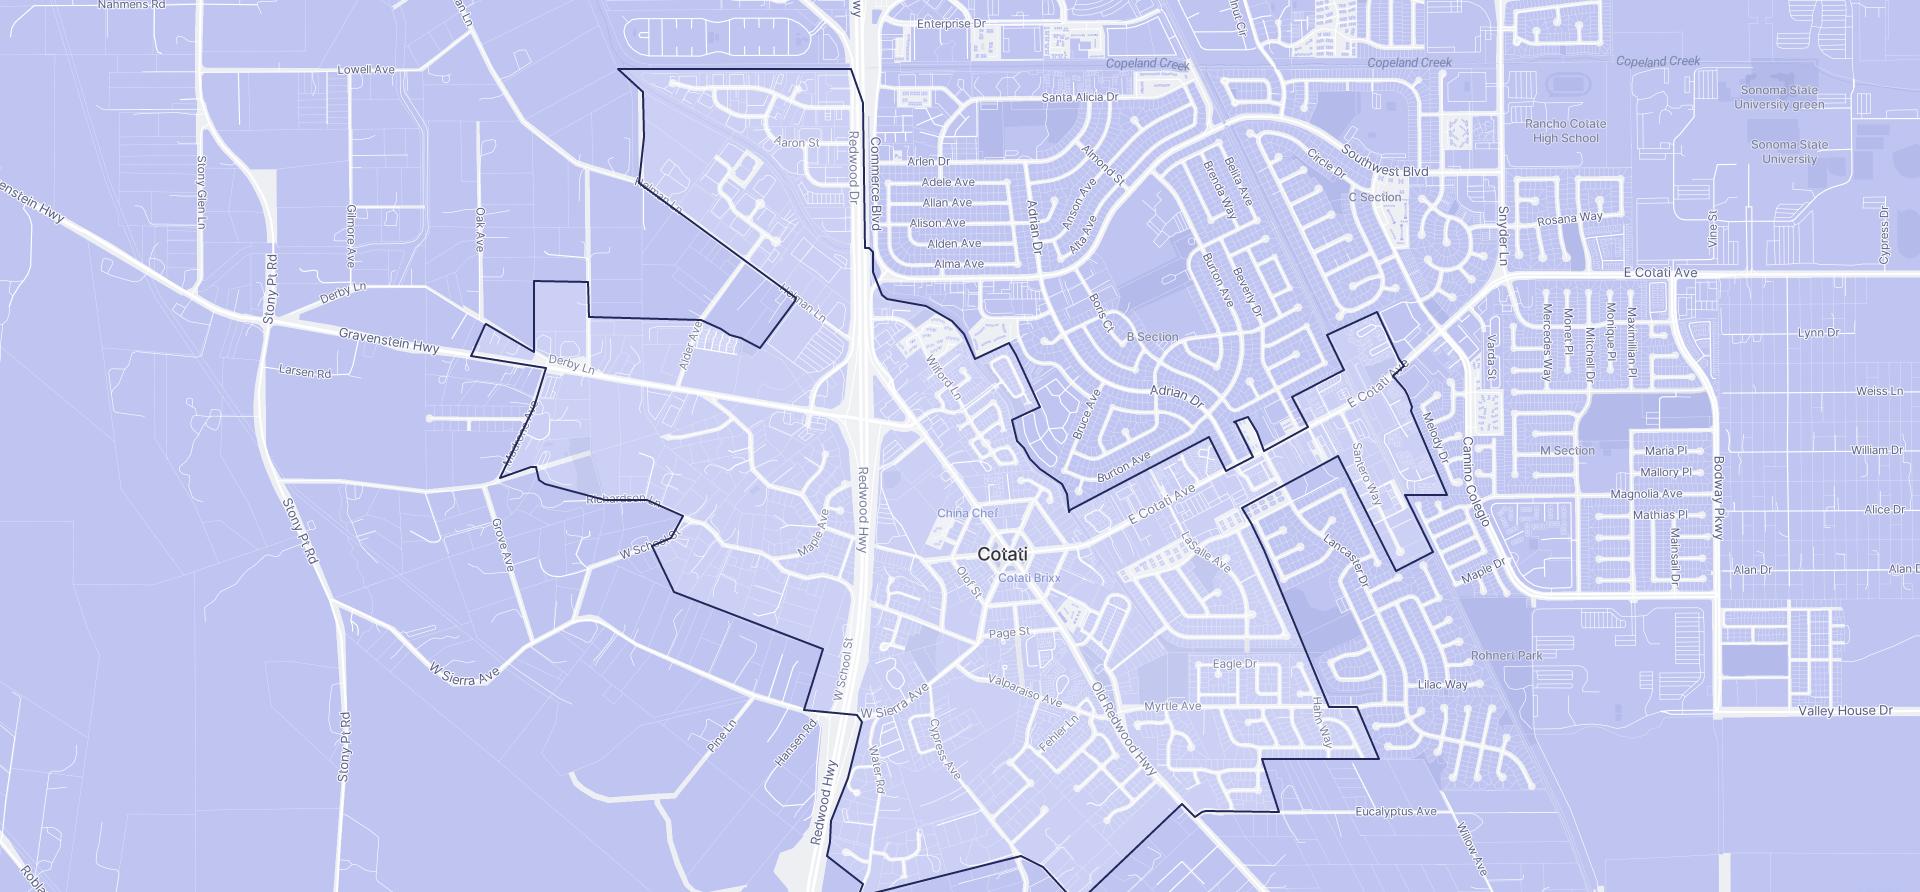 Image of Cotati boundaries on a map.